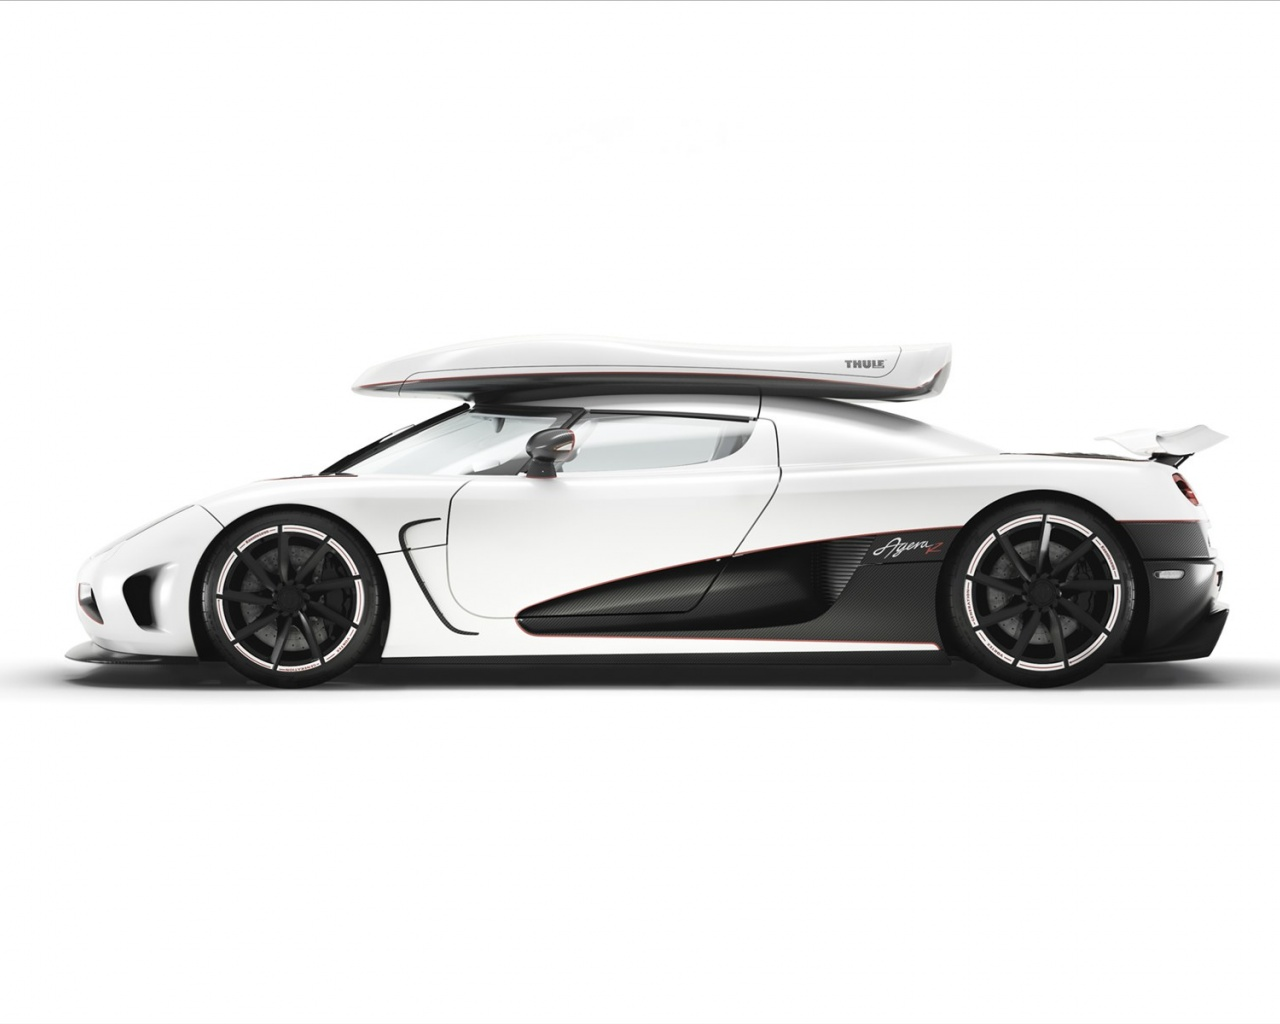 Koenigsegg Agera R 1280x1024 WallpapersKoenigsegg Agera R 1280x1024 1280x1024